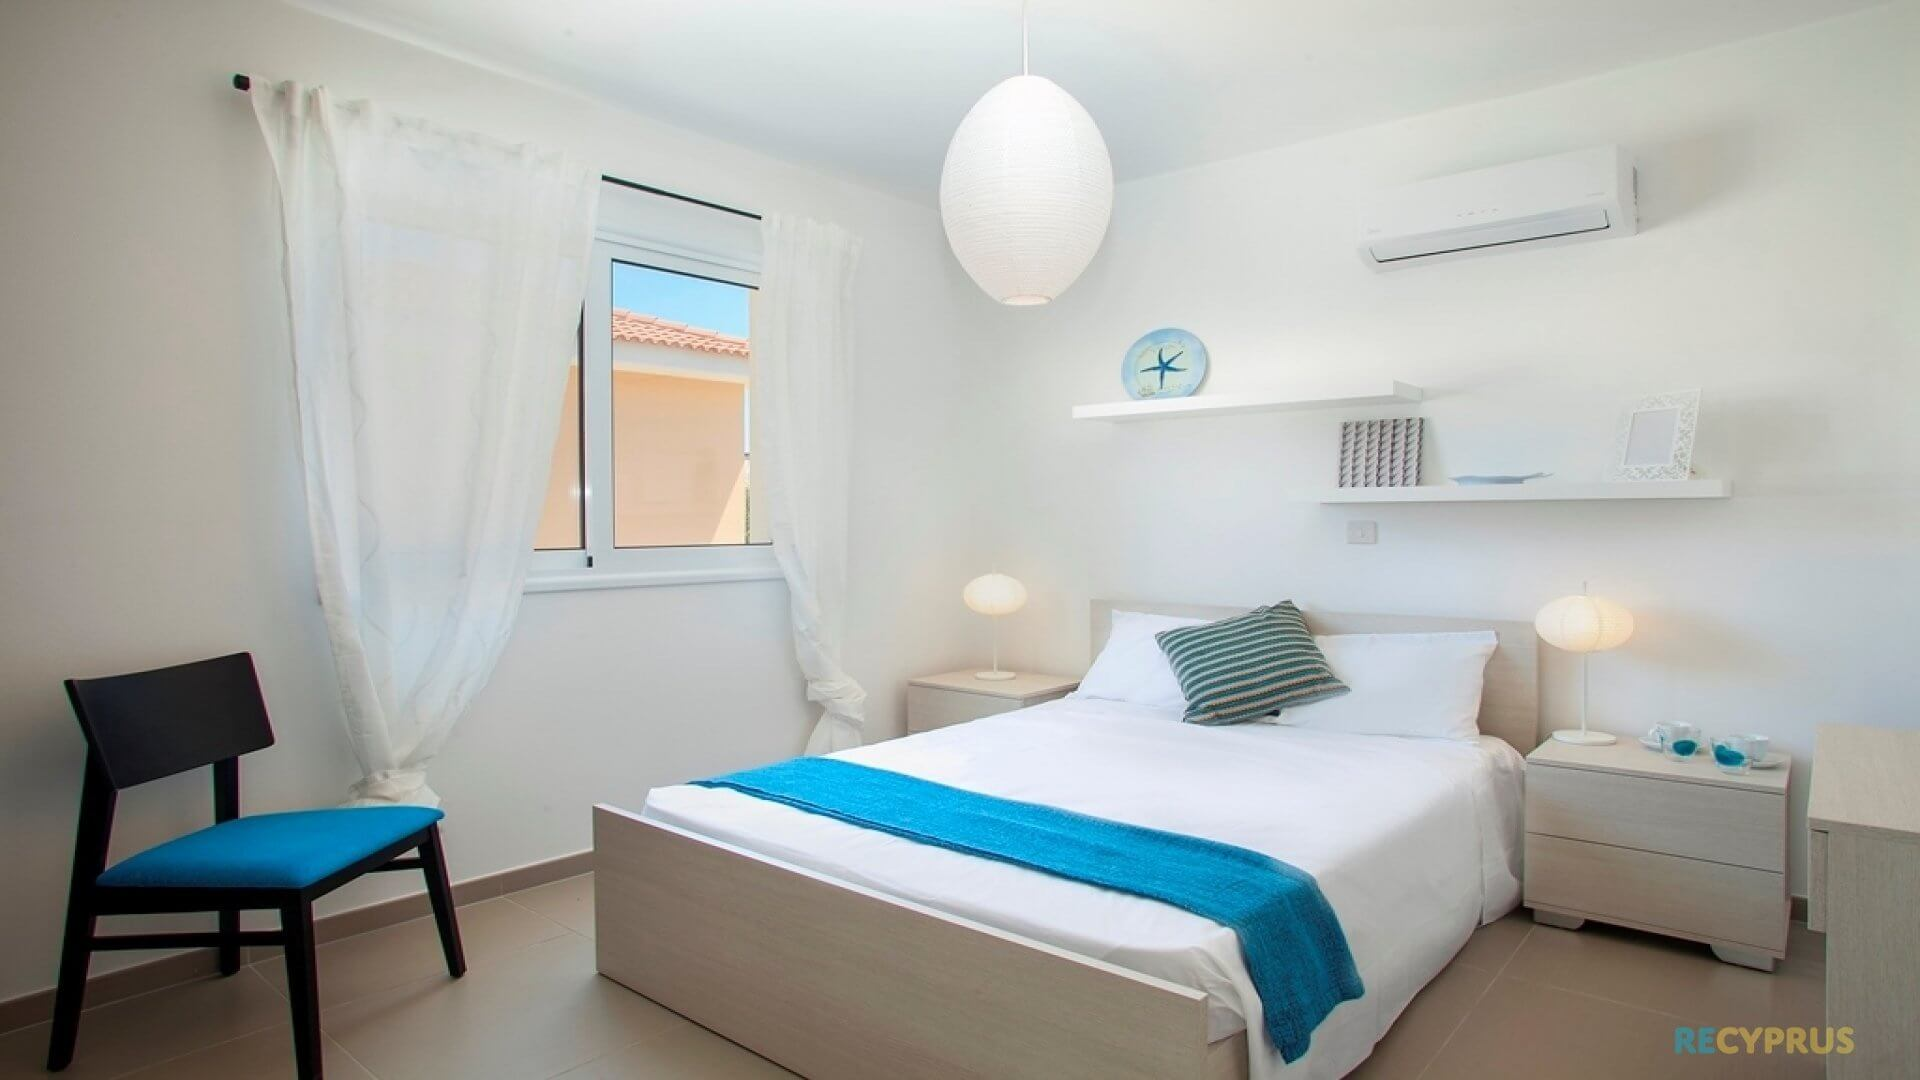 Apartment for sale Kapparis Famagusta Cyprus 6 3443